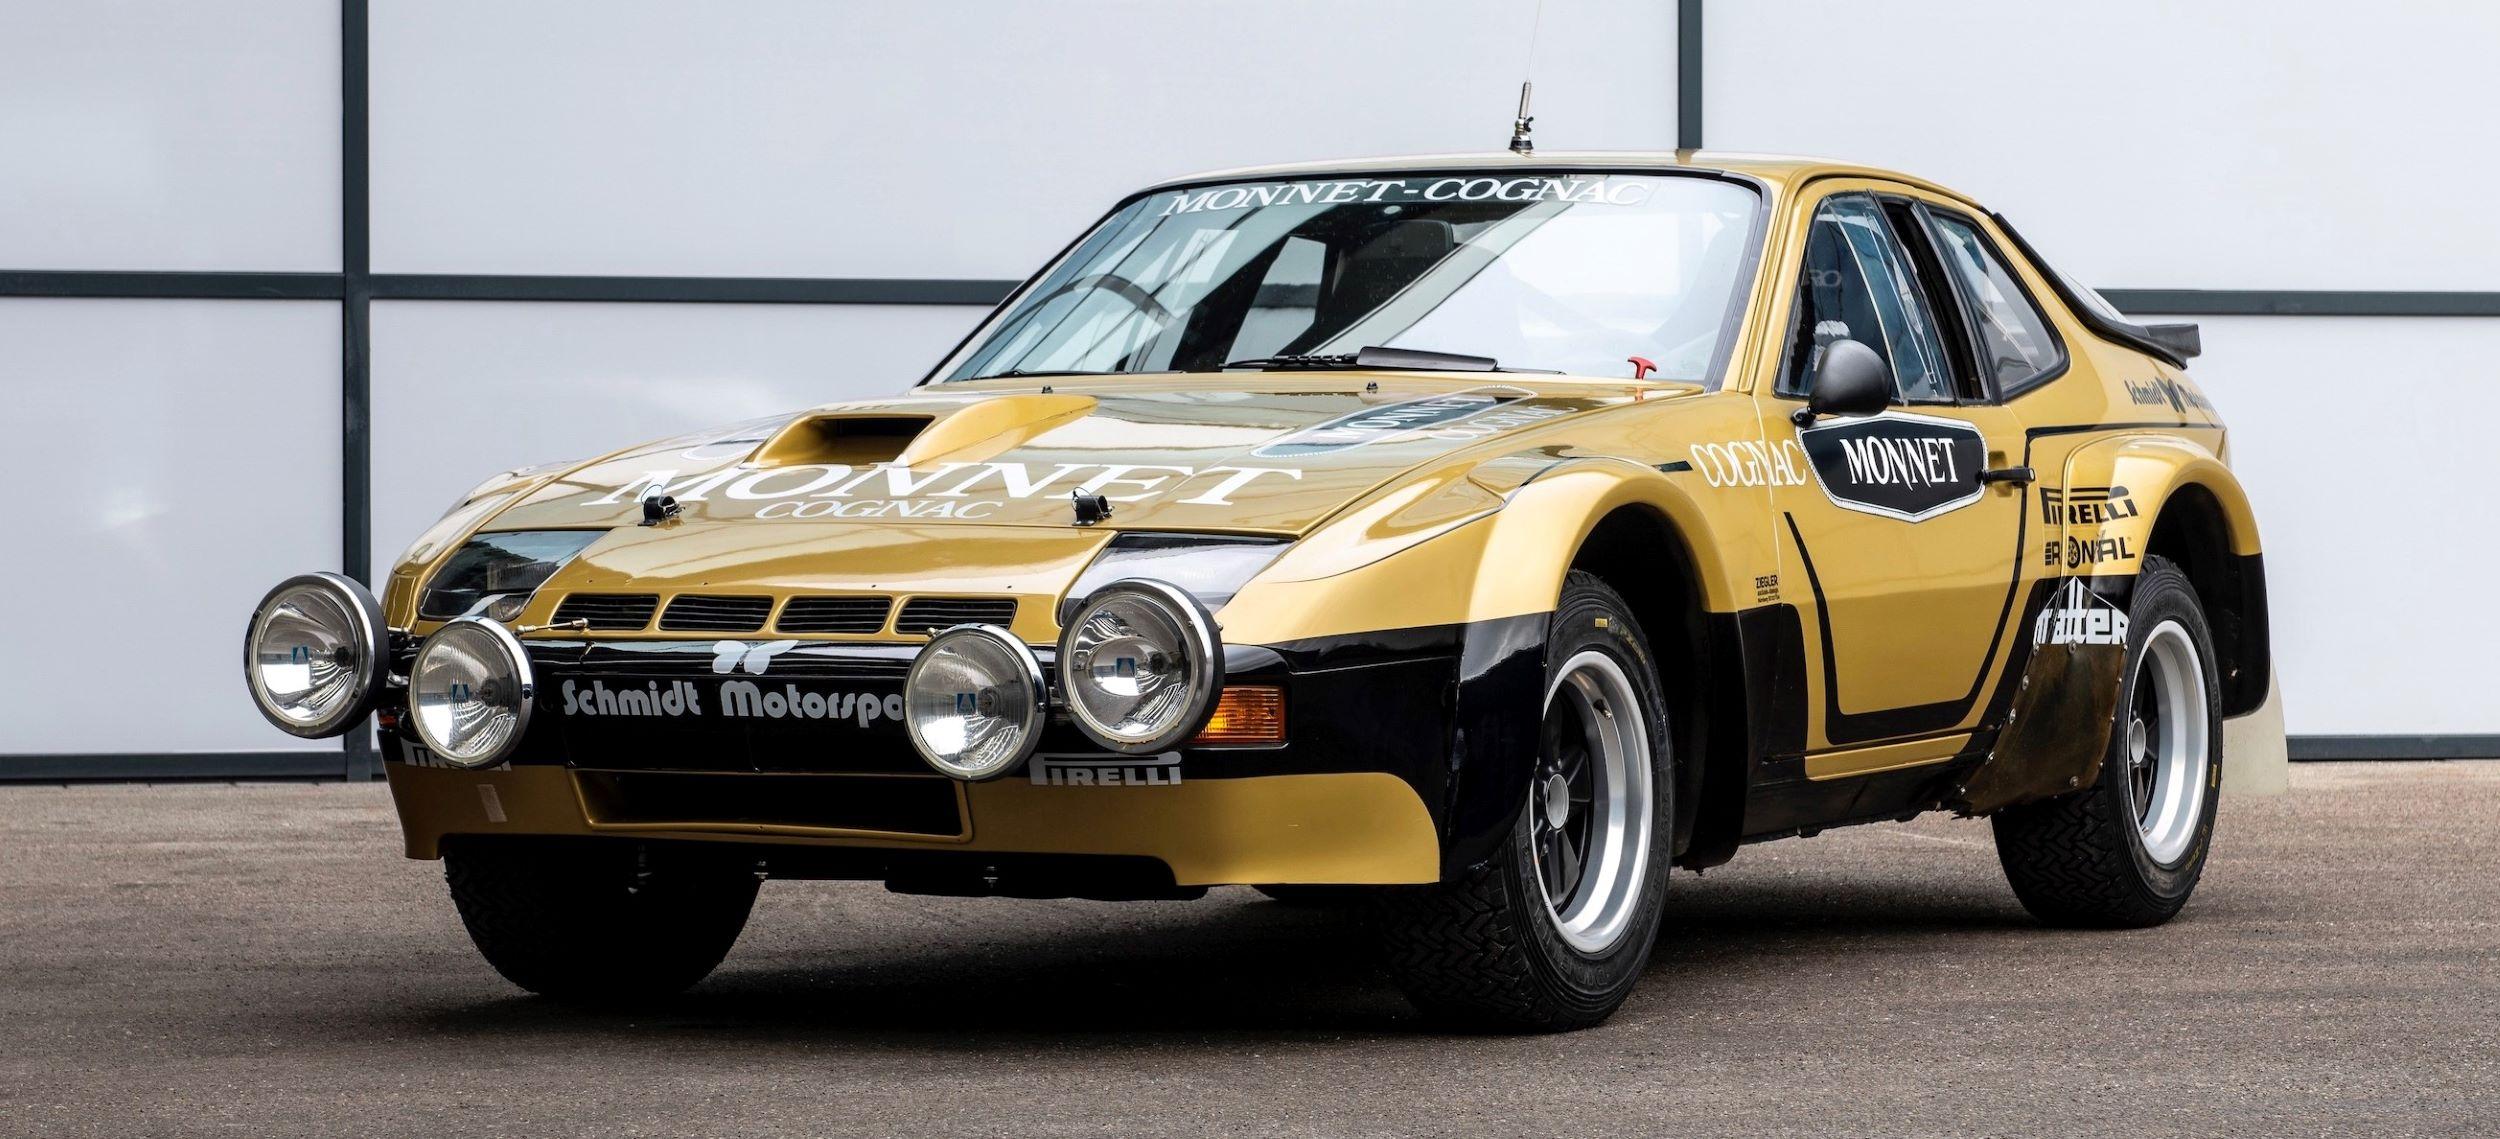 Porsche 924 Carrera GTS Rally